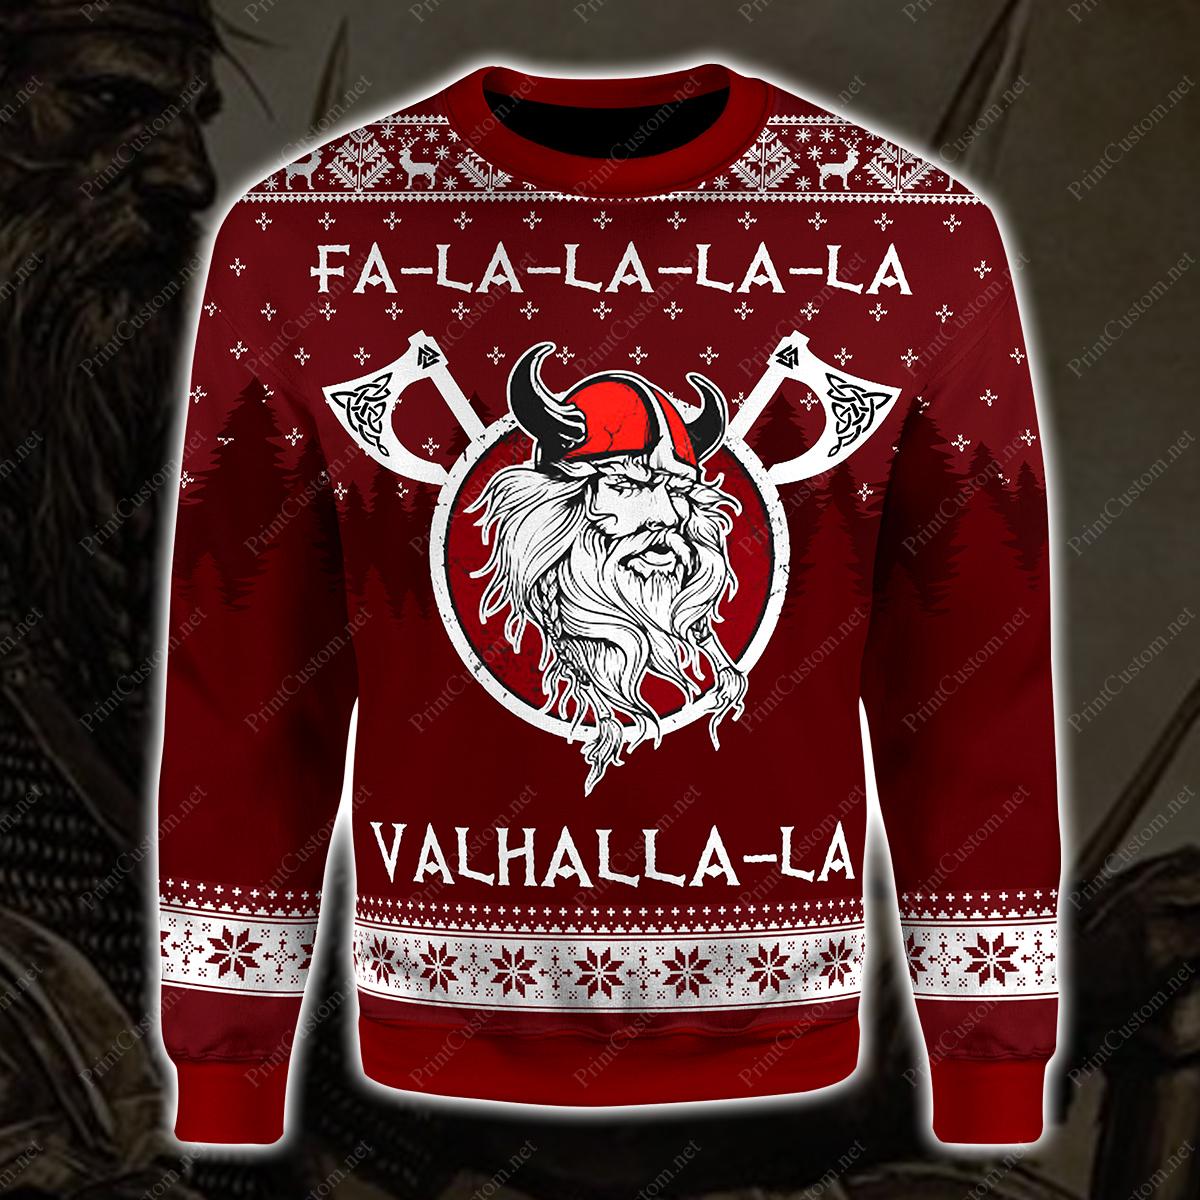 Fa-la-la-la-la valhalla-la viking ugly christmas sweater 4